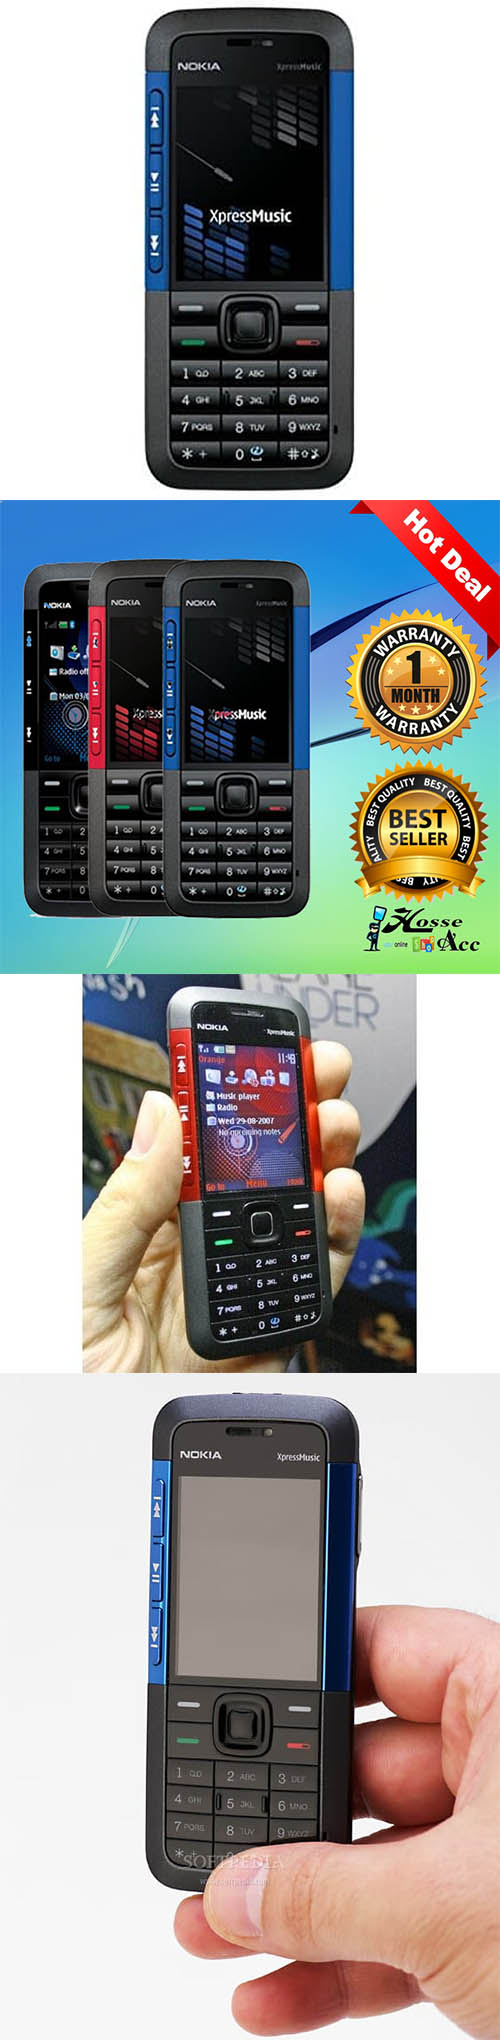 Nokia 5310 xpress music refurbish